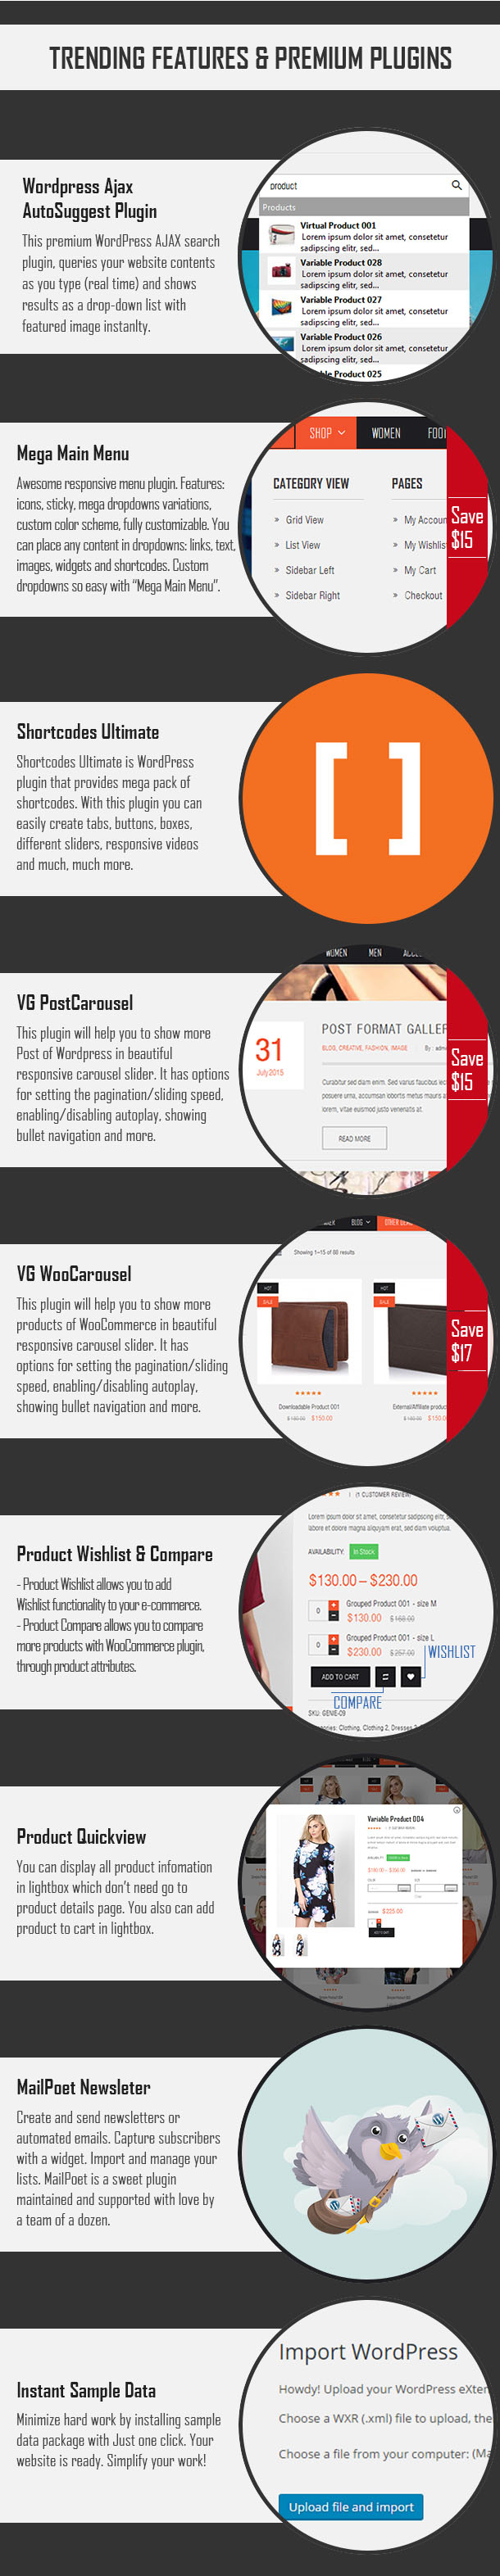 VG NewYork - Responsive WooCommerce WordPress Theme - 25